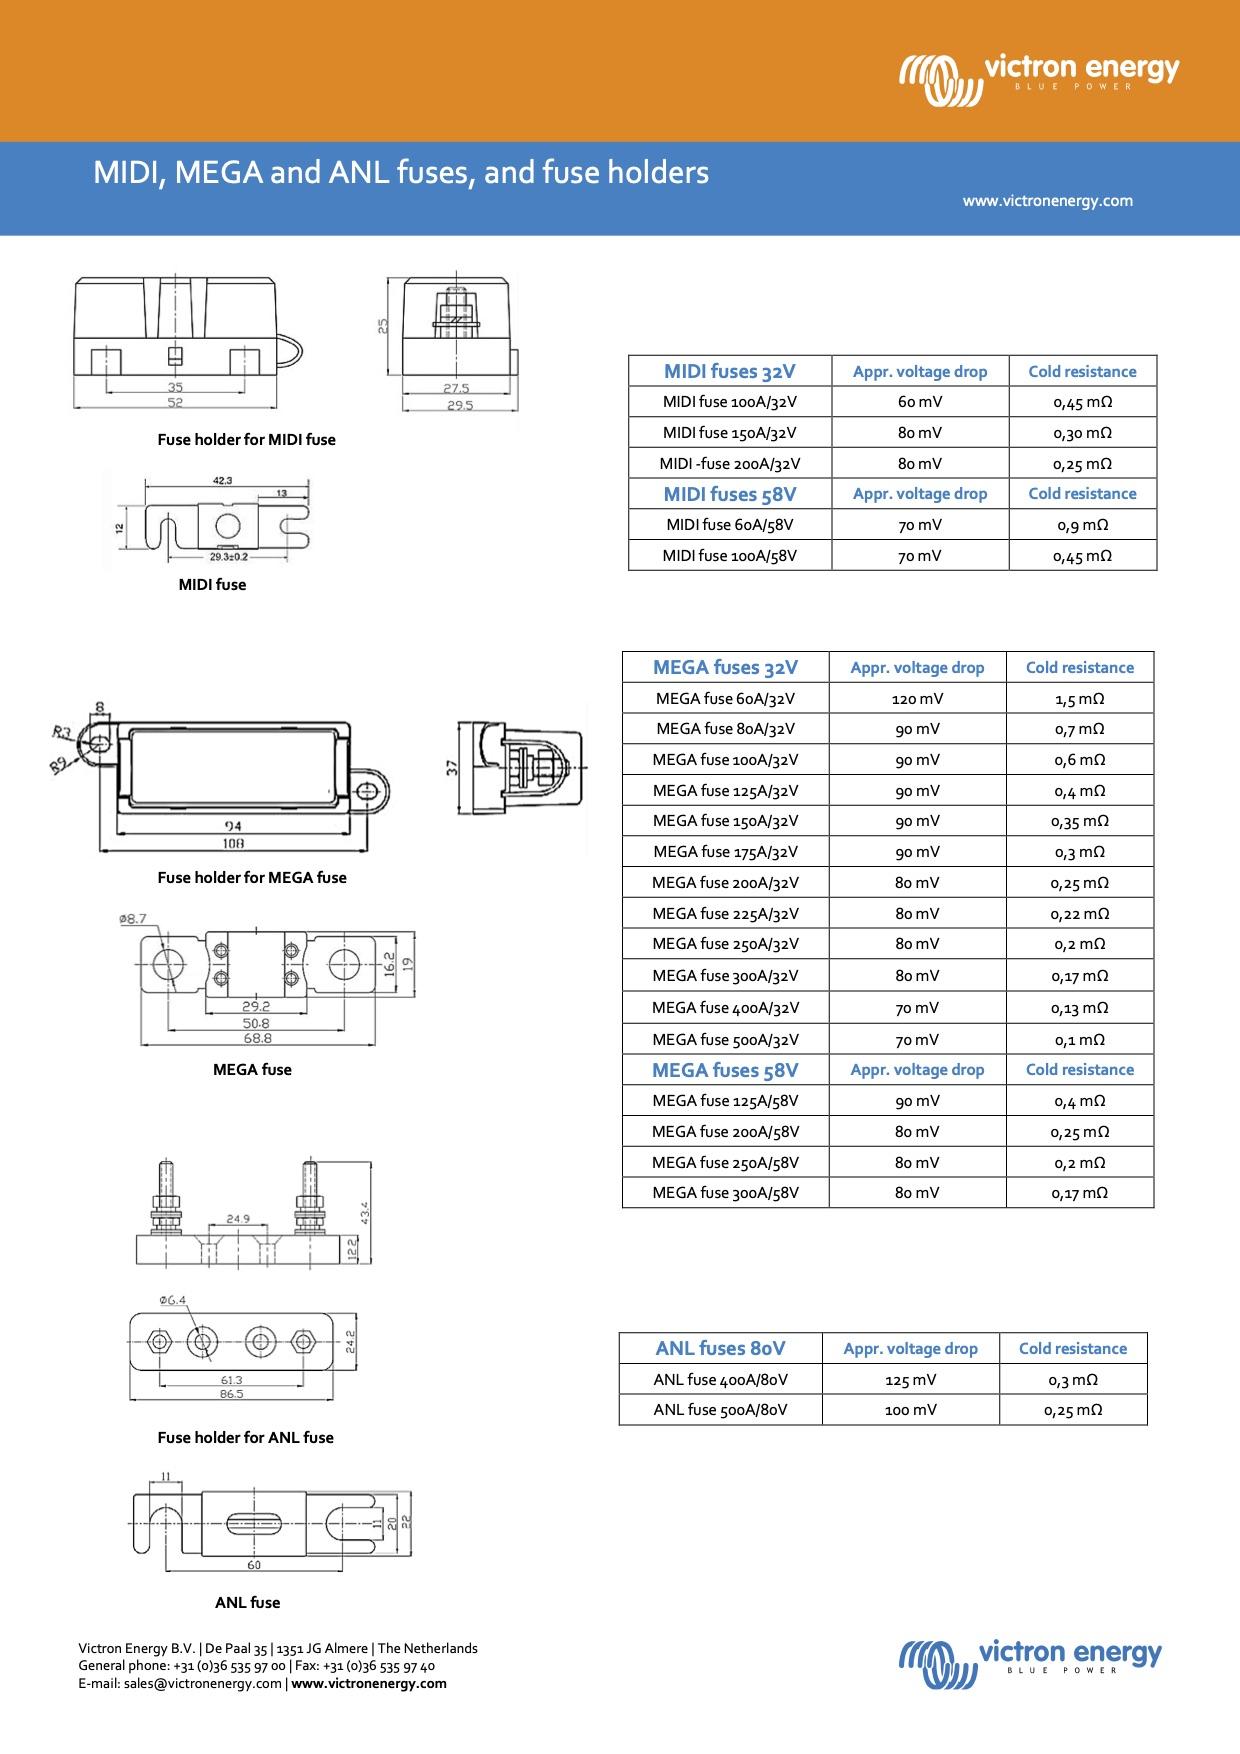 mega-fuses-and-fuse-holders-en